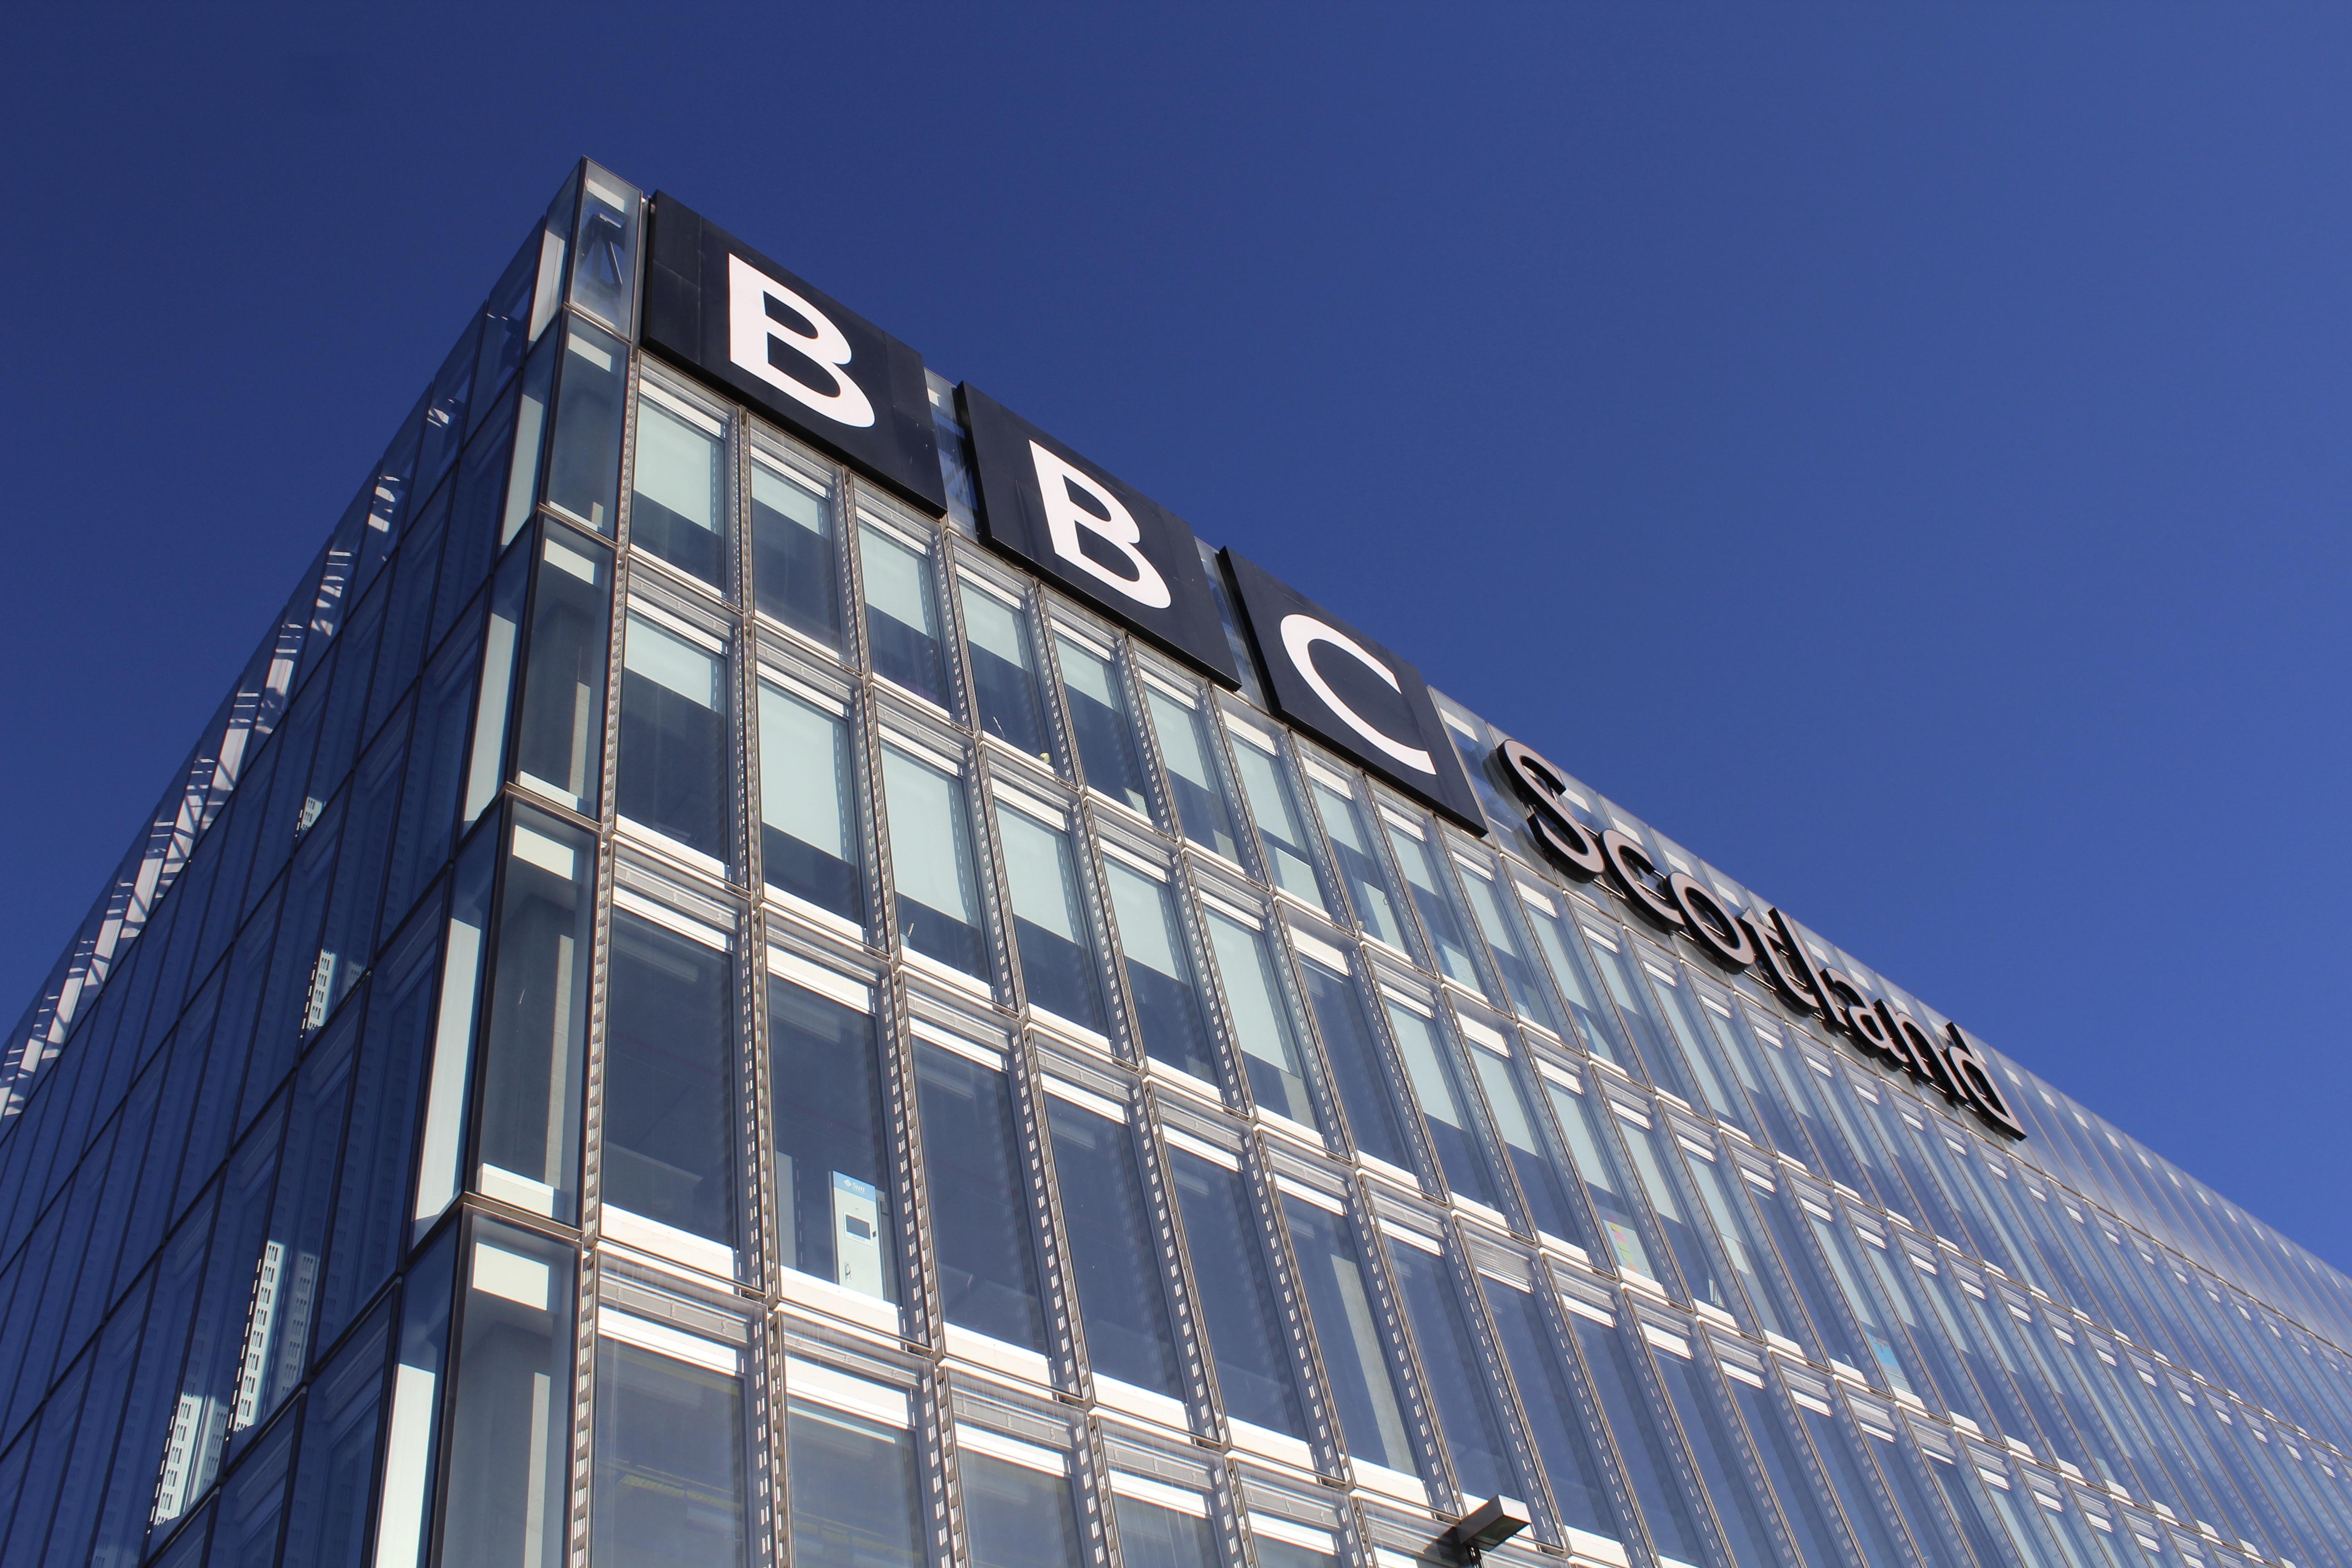 BBC Scotland